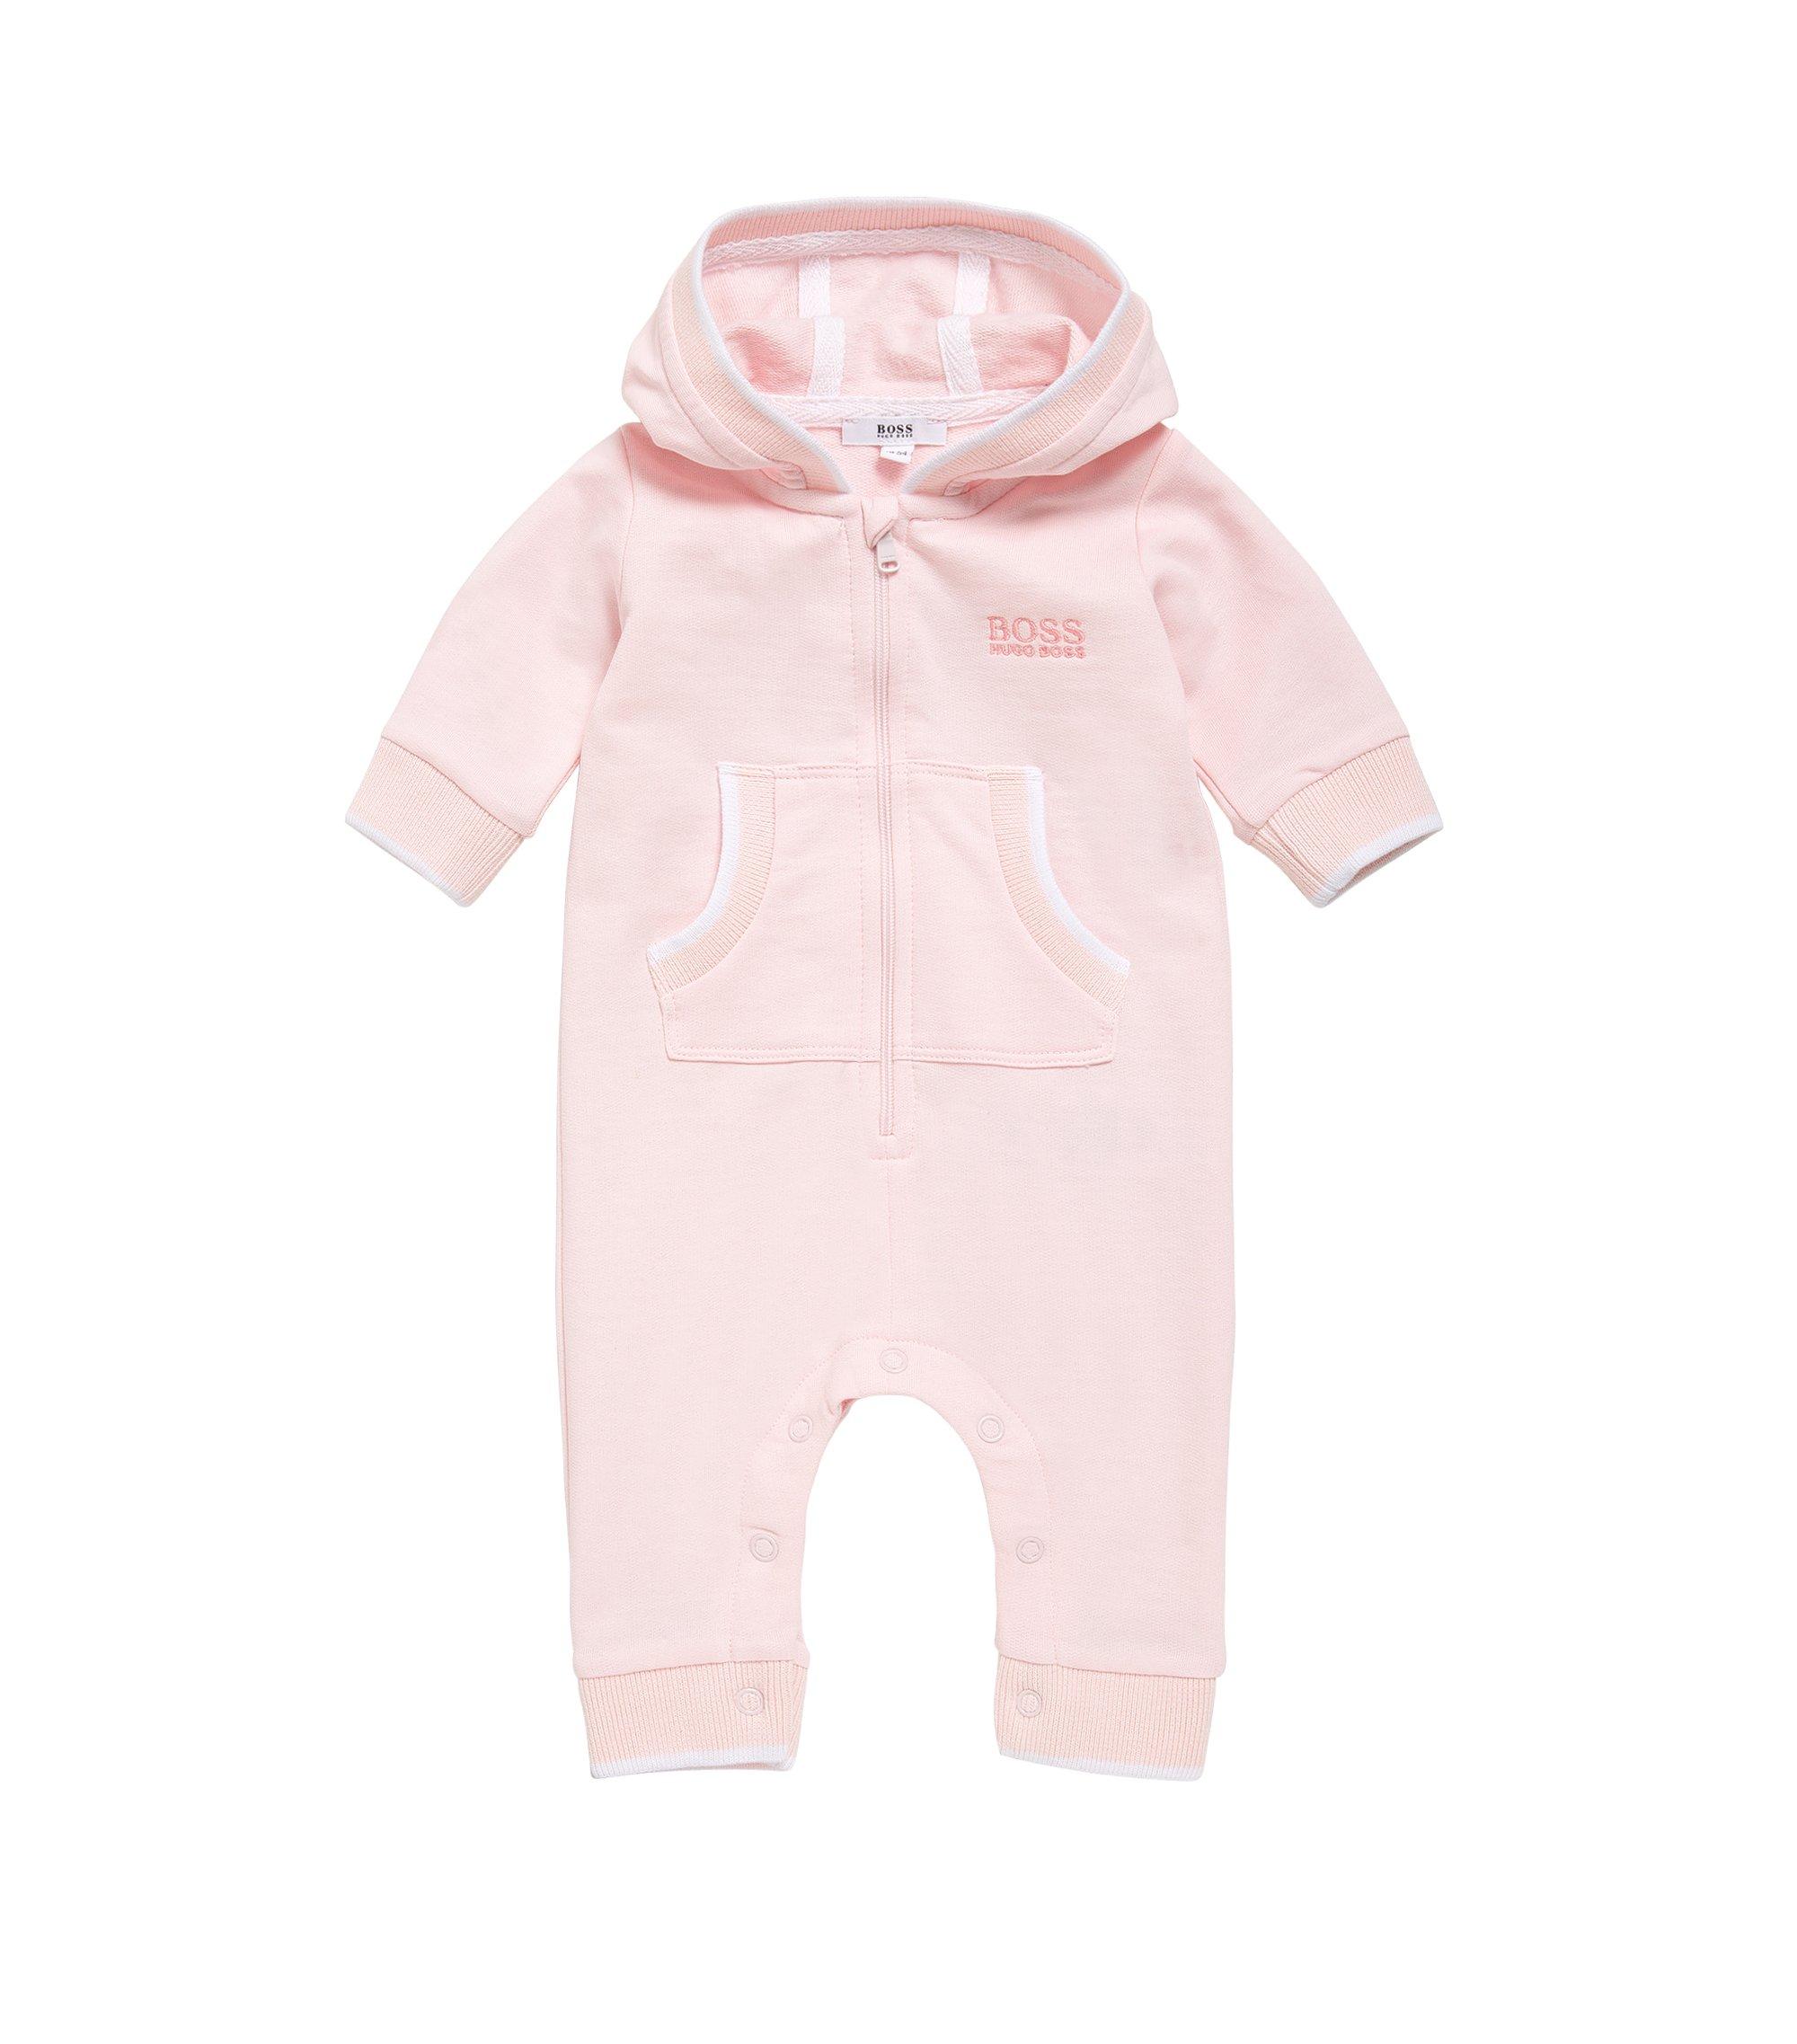 Baby-Overall aus Baumwolle mit Kapuze: 'J94172', Hellrosa